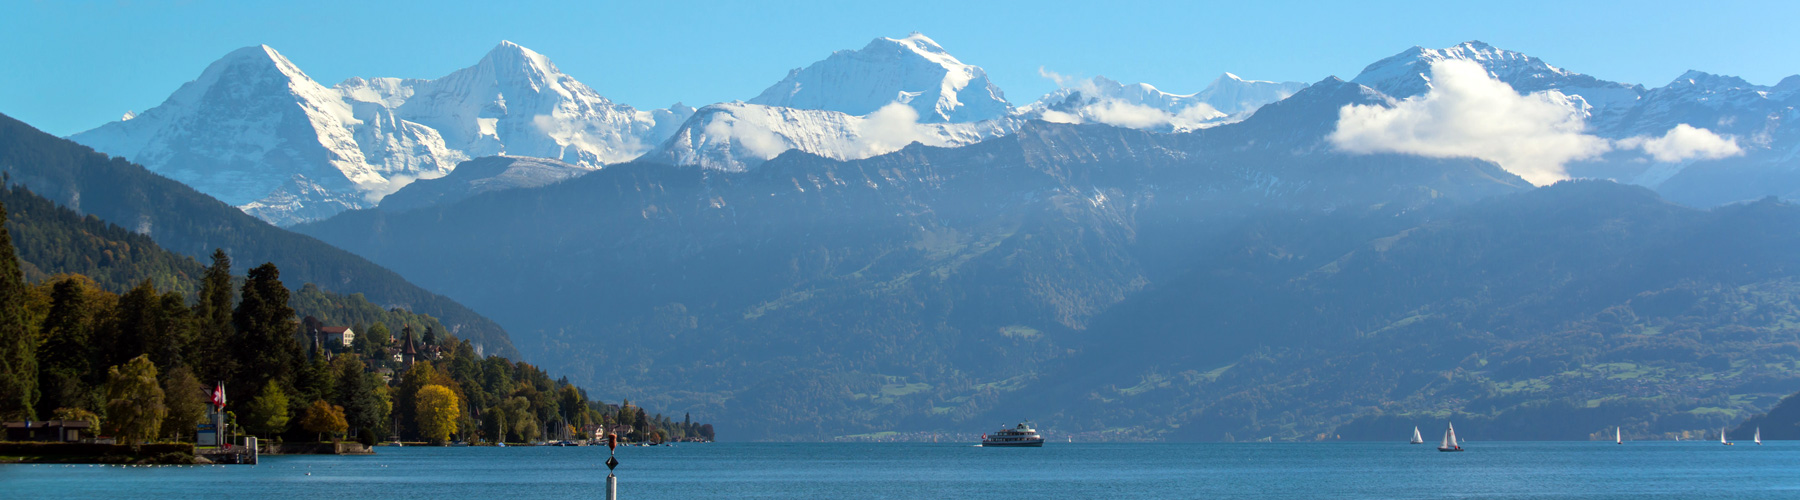 Thunersee Eiger Mönch Jungfrau